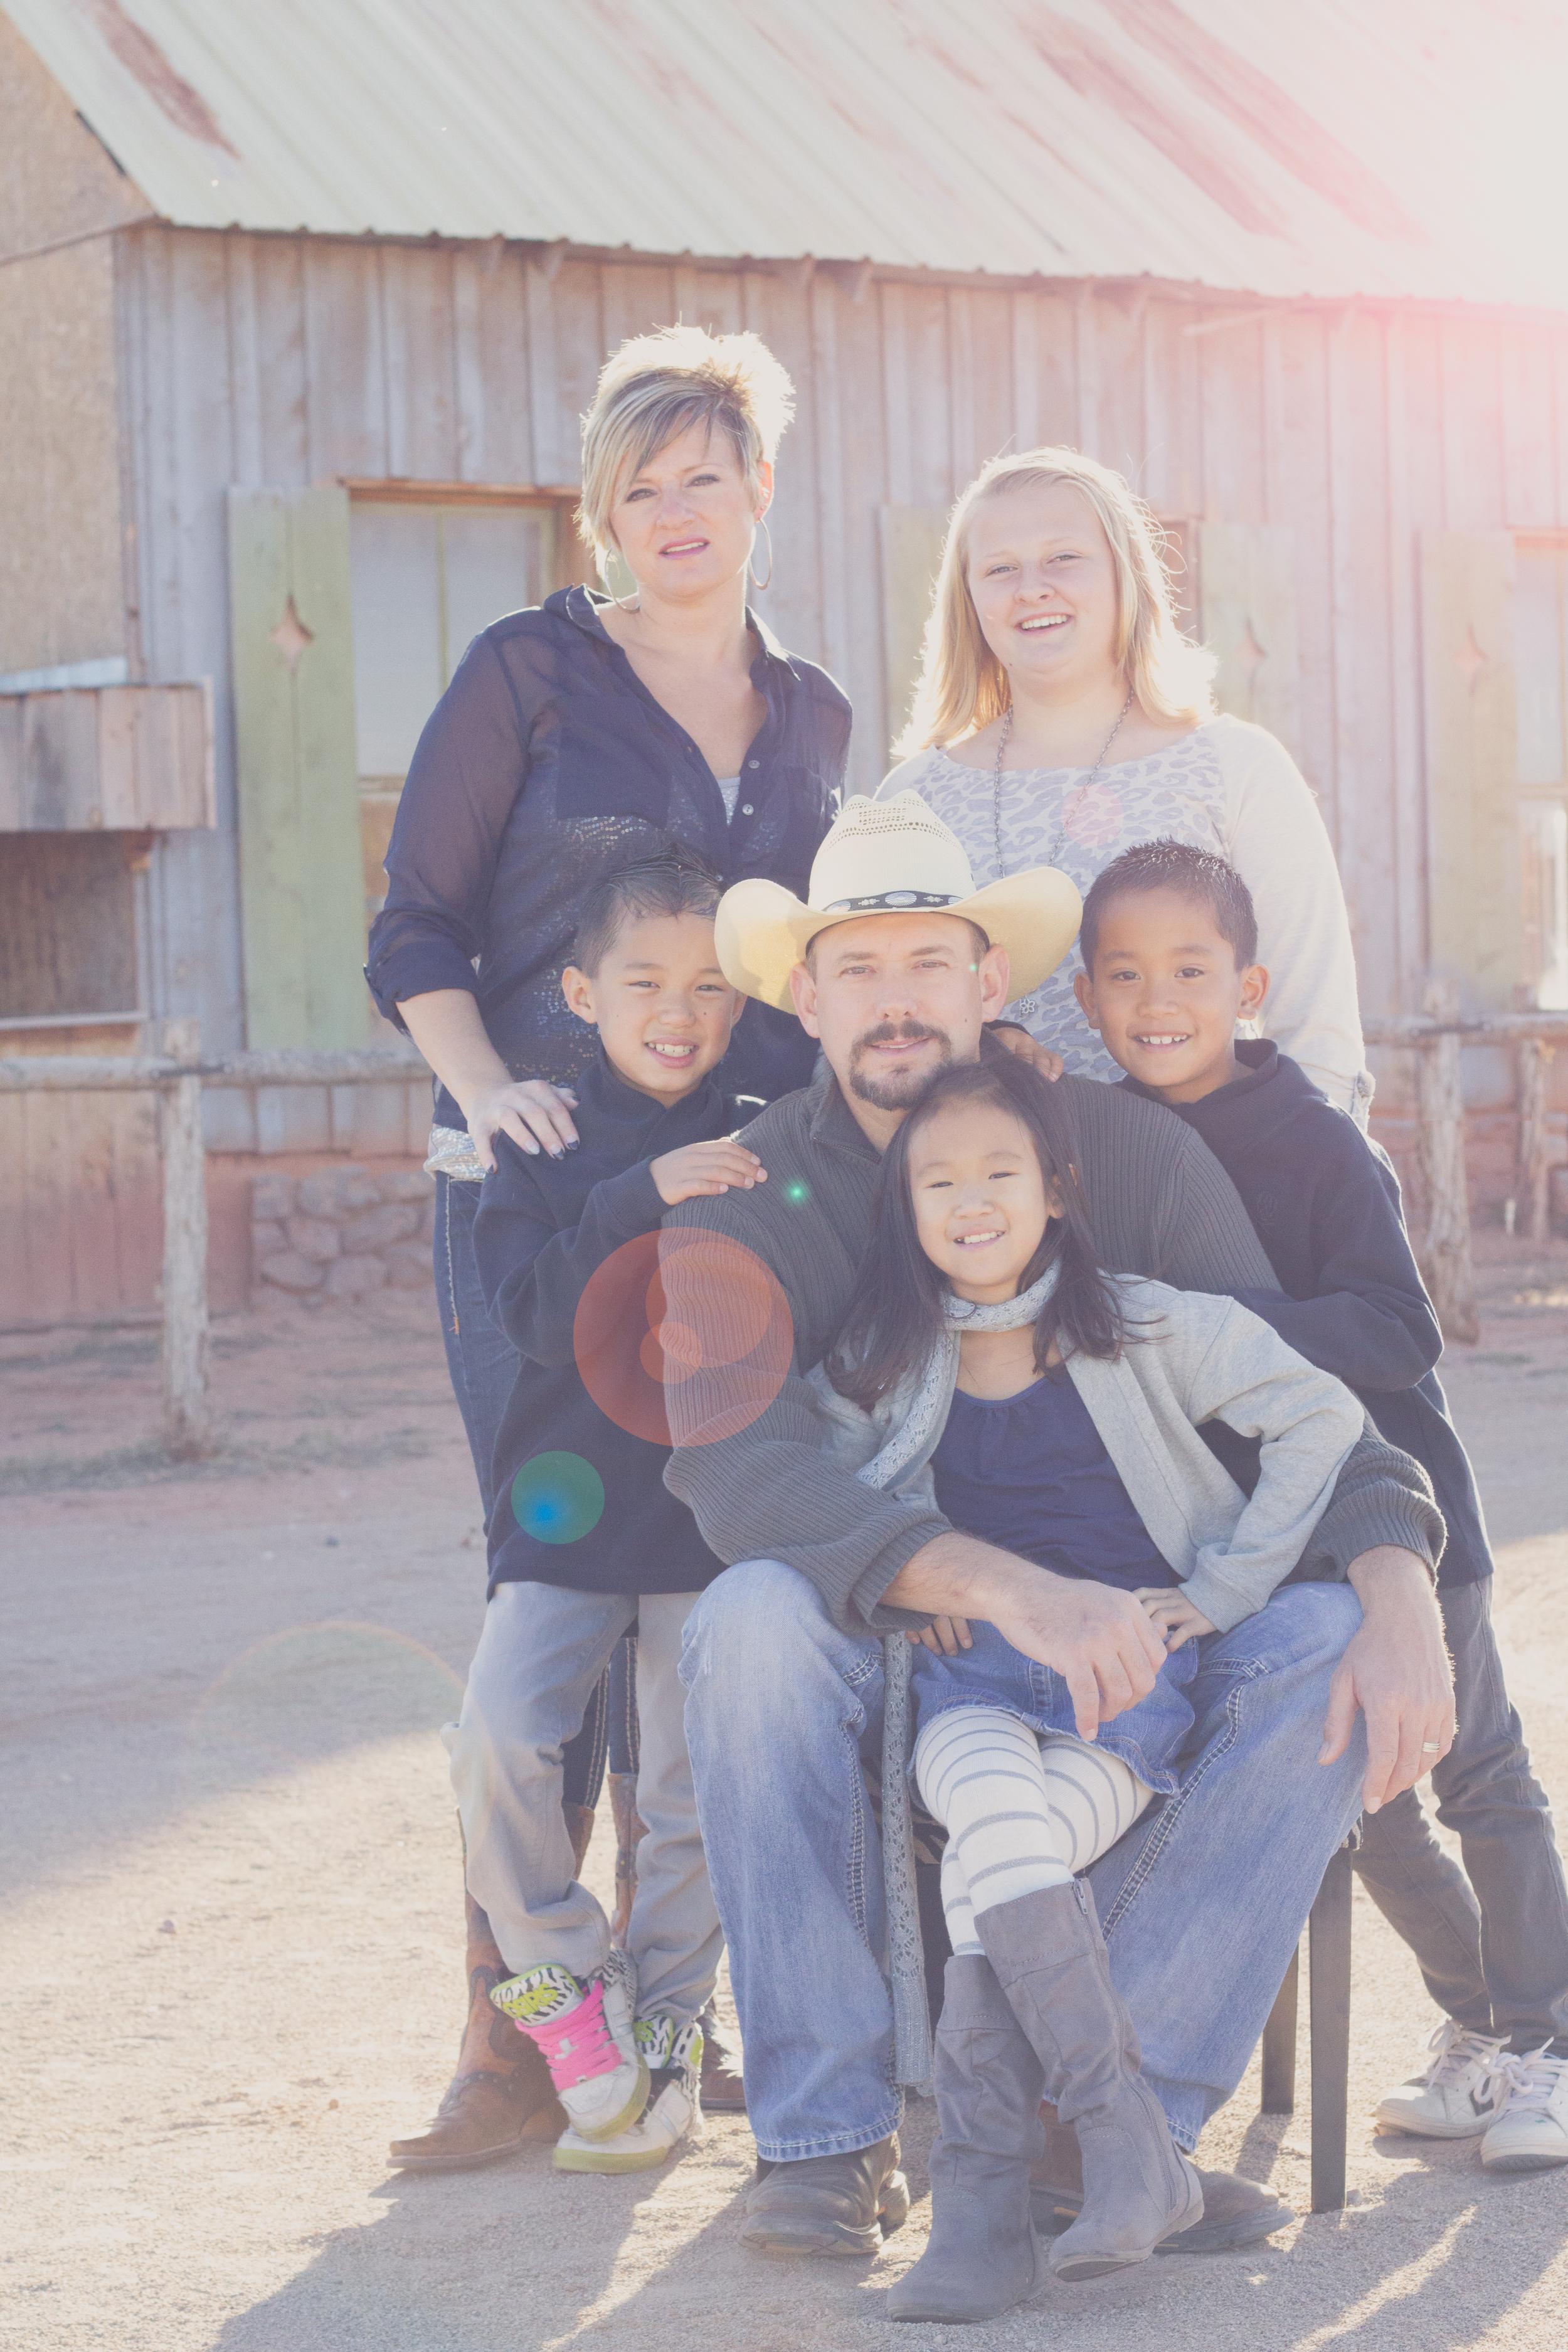 Paxman Family - Photographer: Mallory Burton